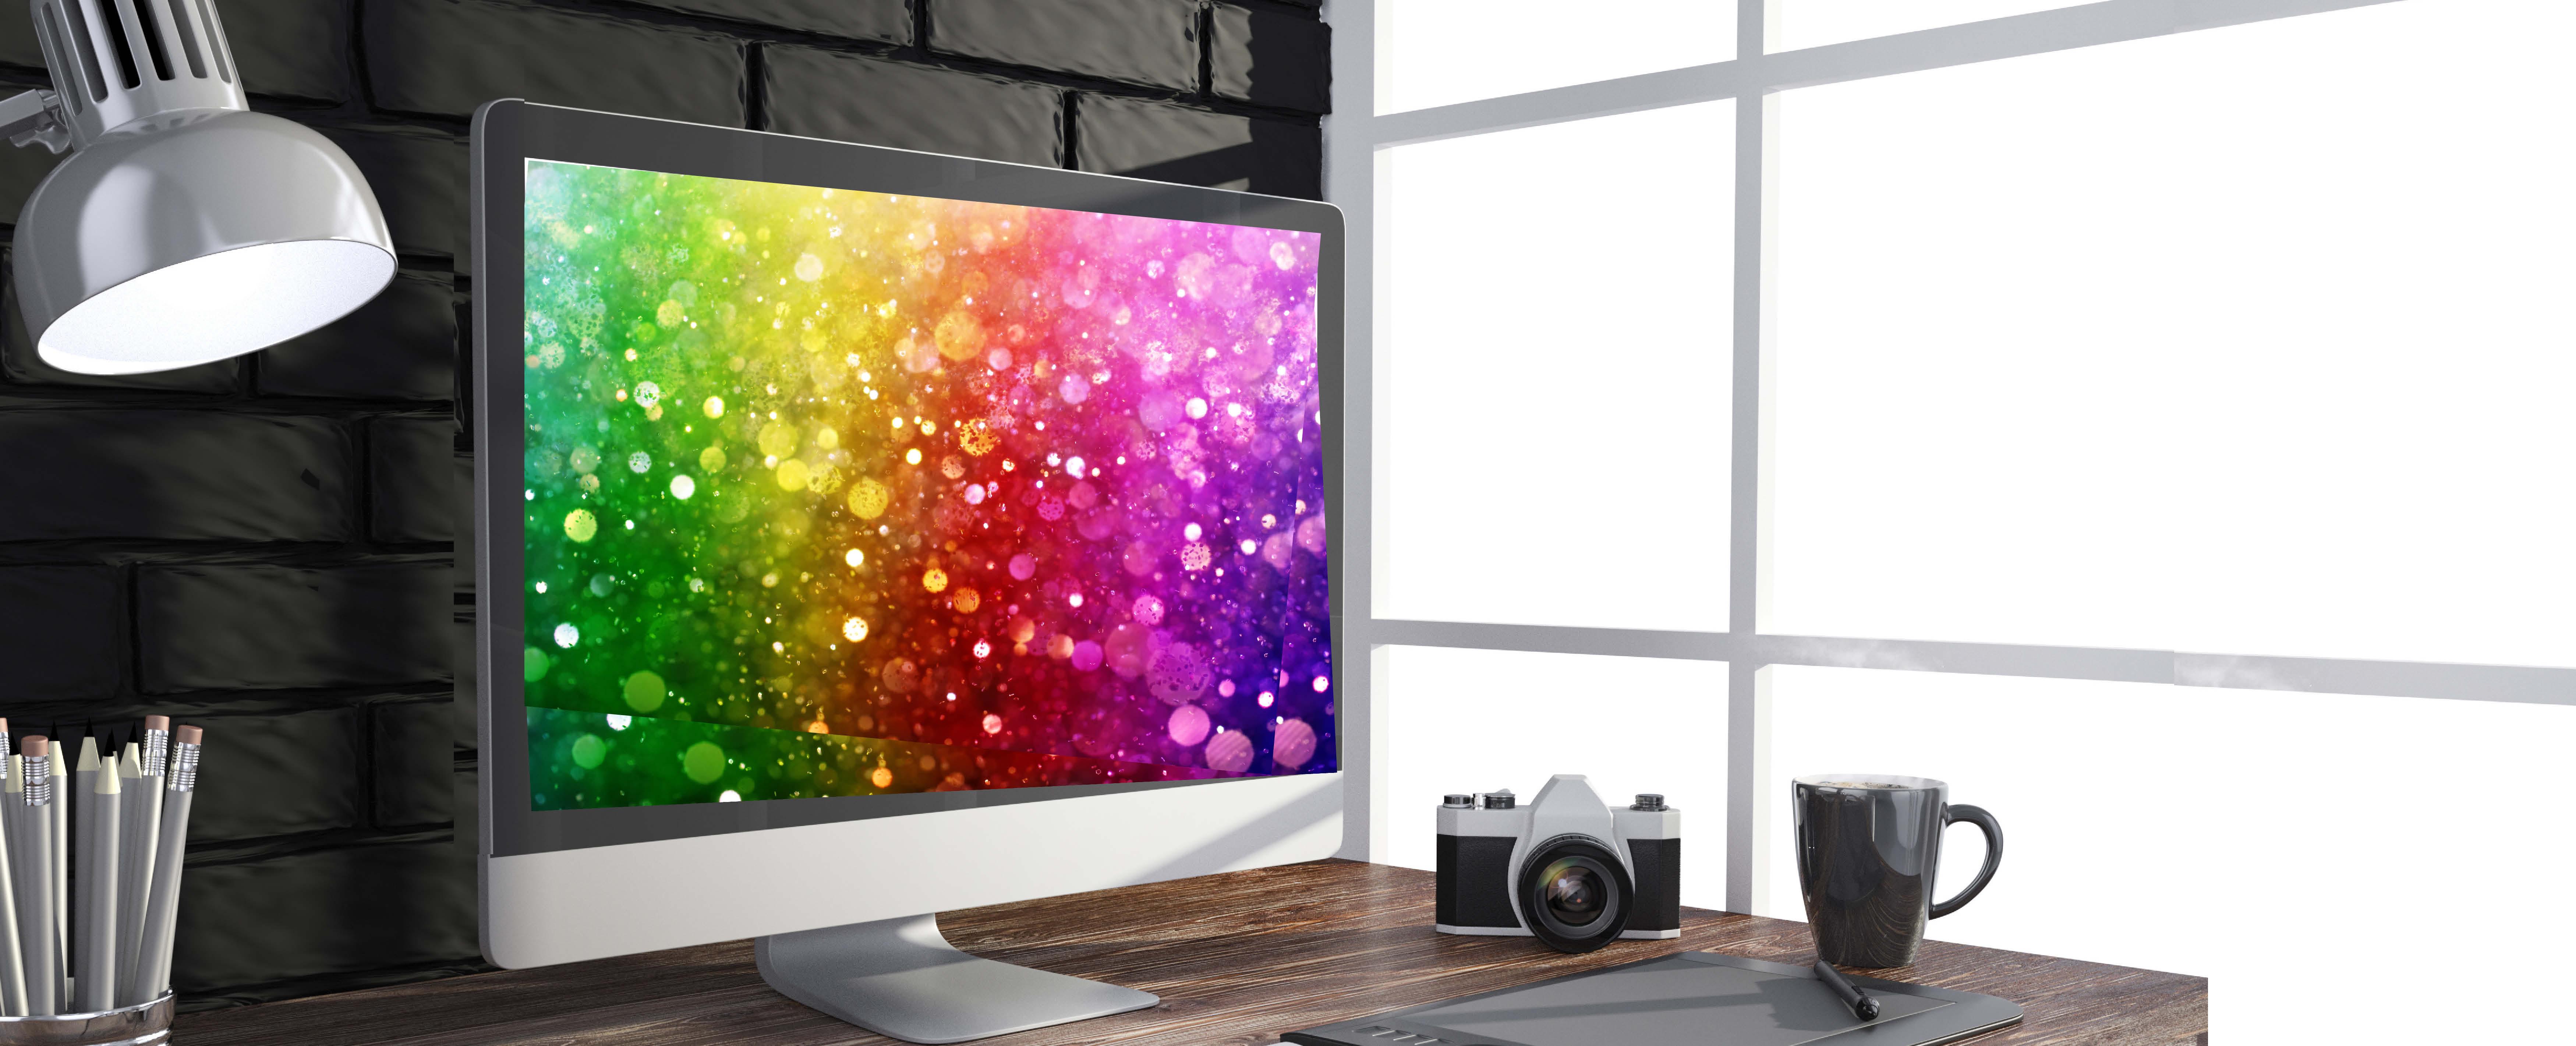 iwc Color blog